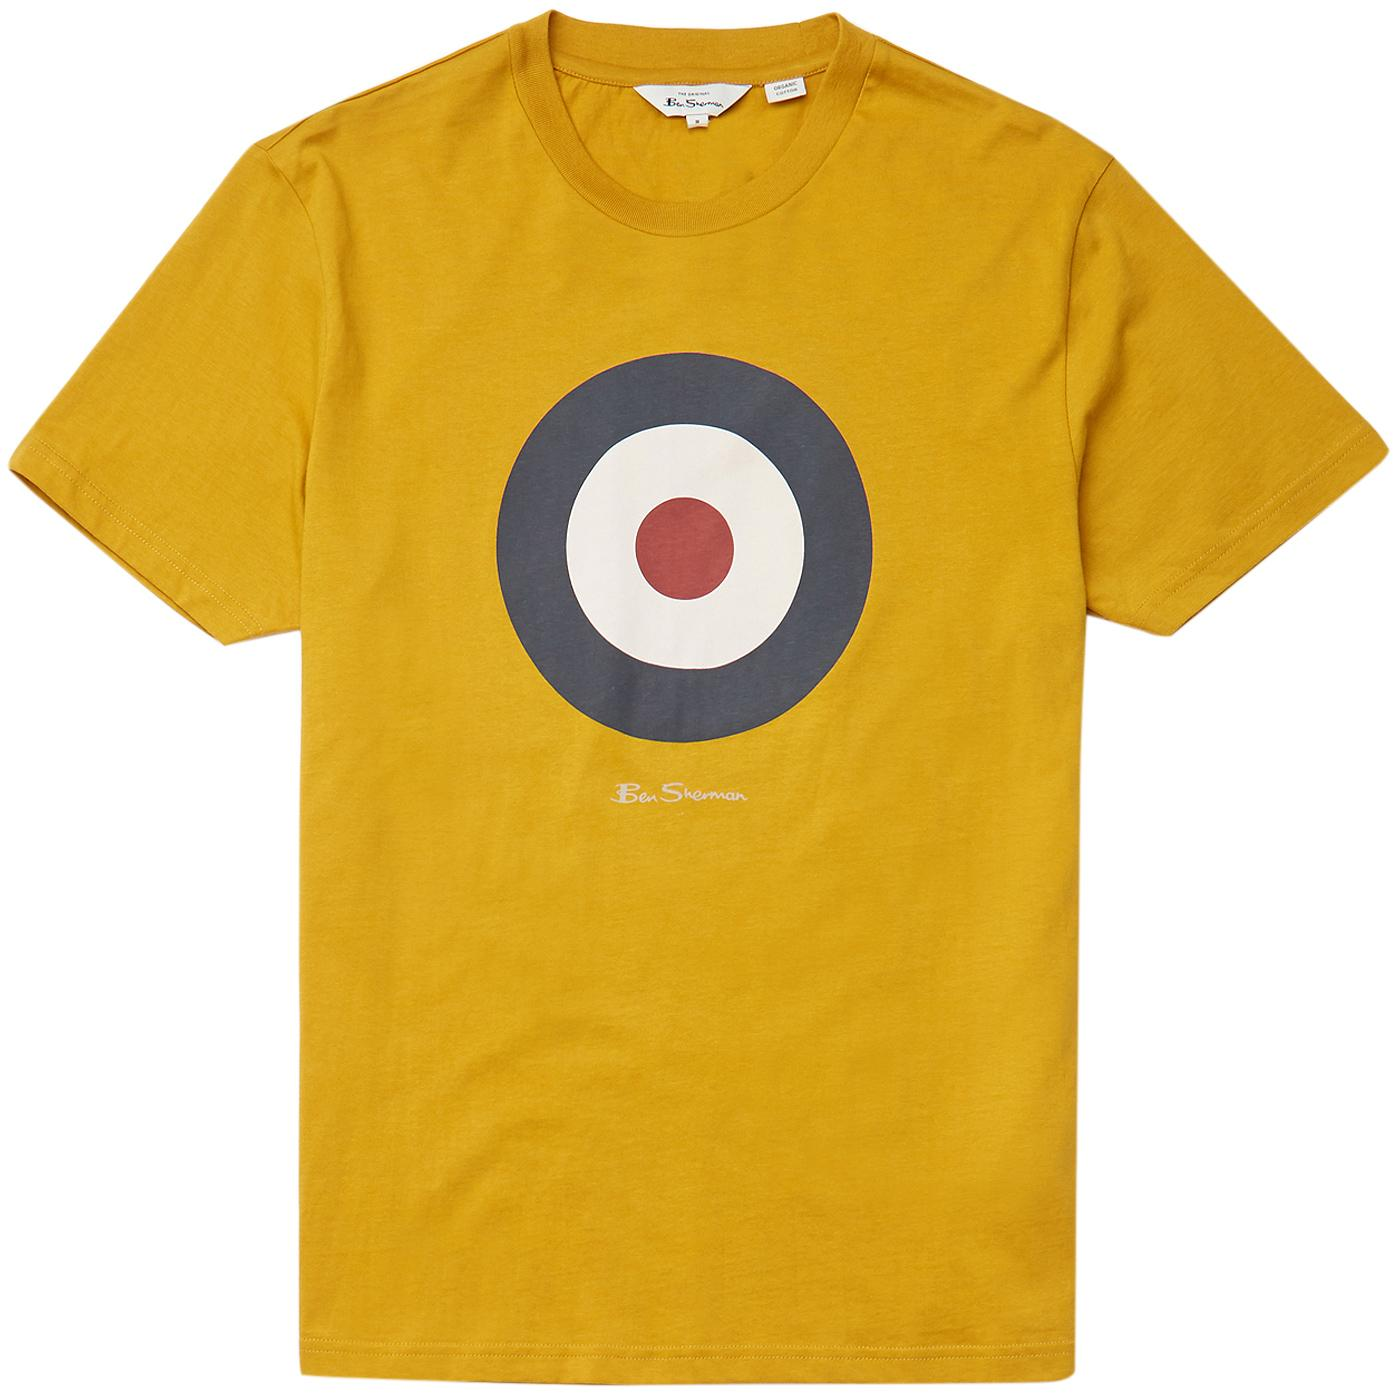 BEN SHERMAN 60s Pop Art Mod Target Tee (Mustard)